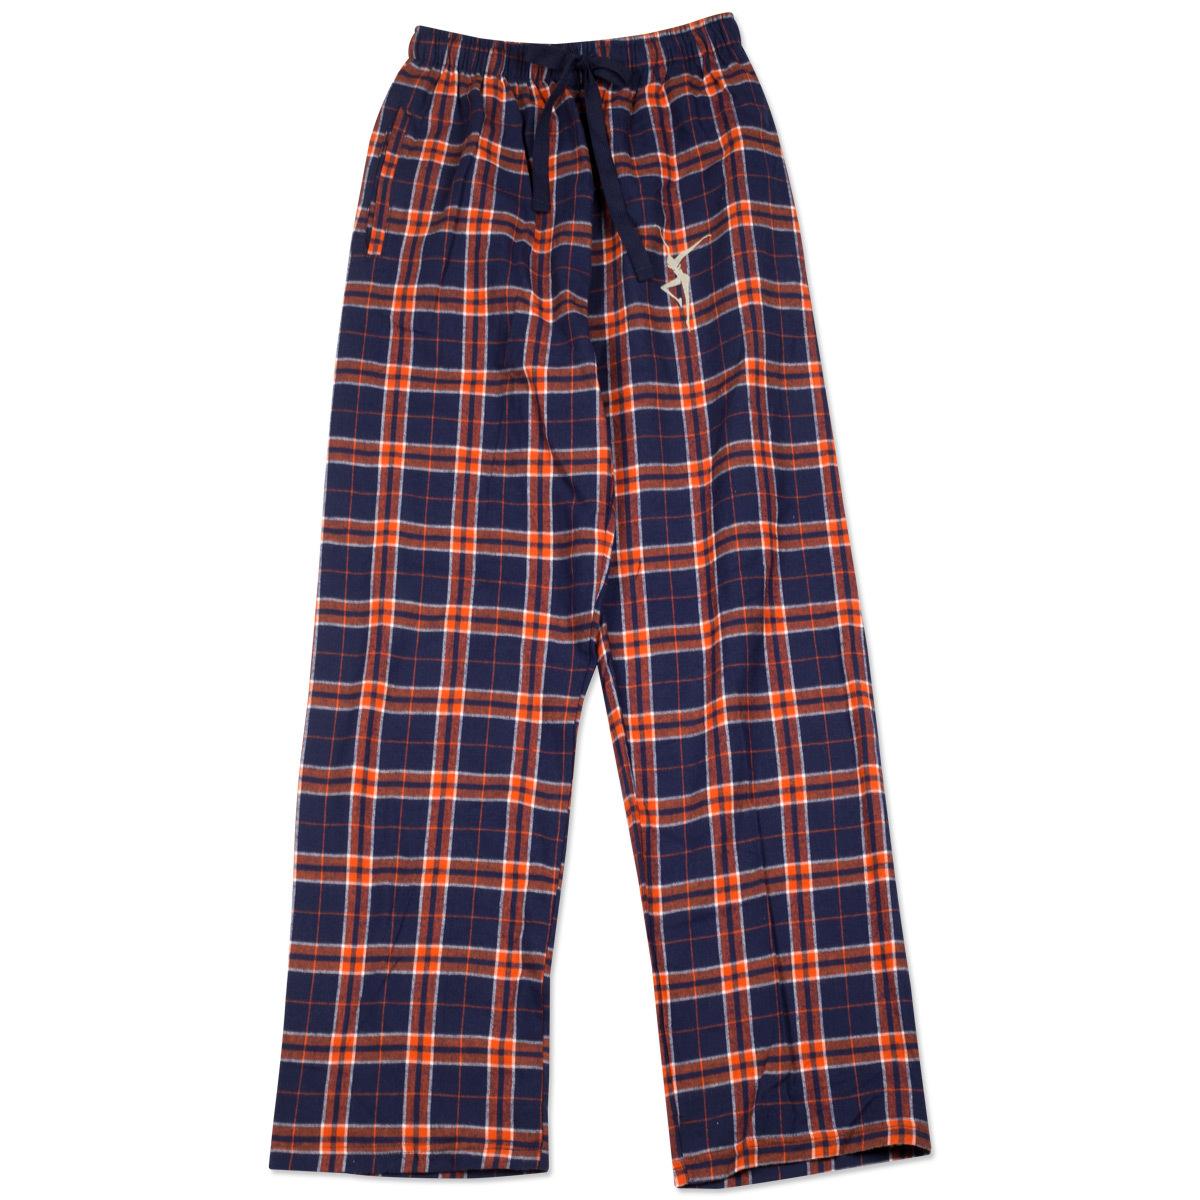 DMB Flannel Firedancer PJ Pants - Navy/Orange